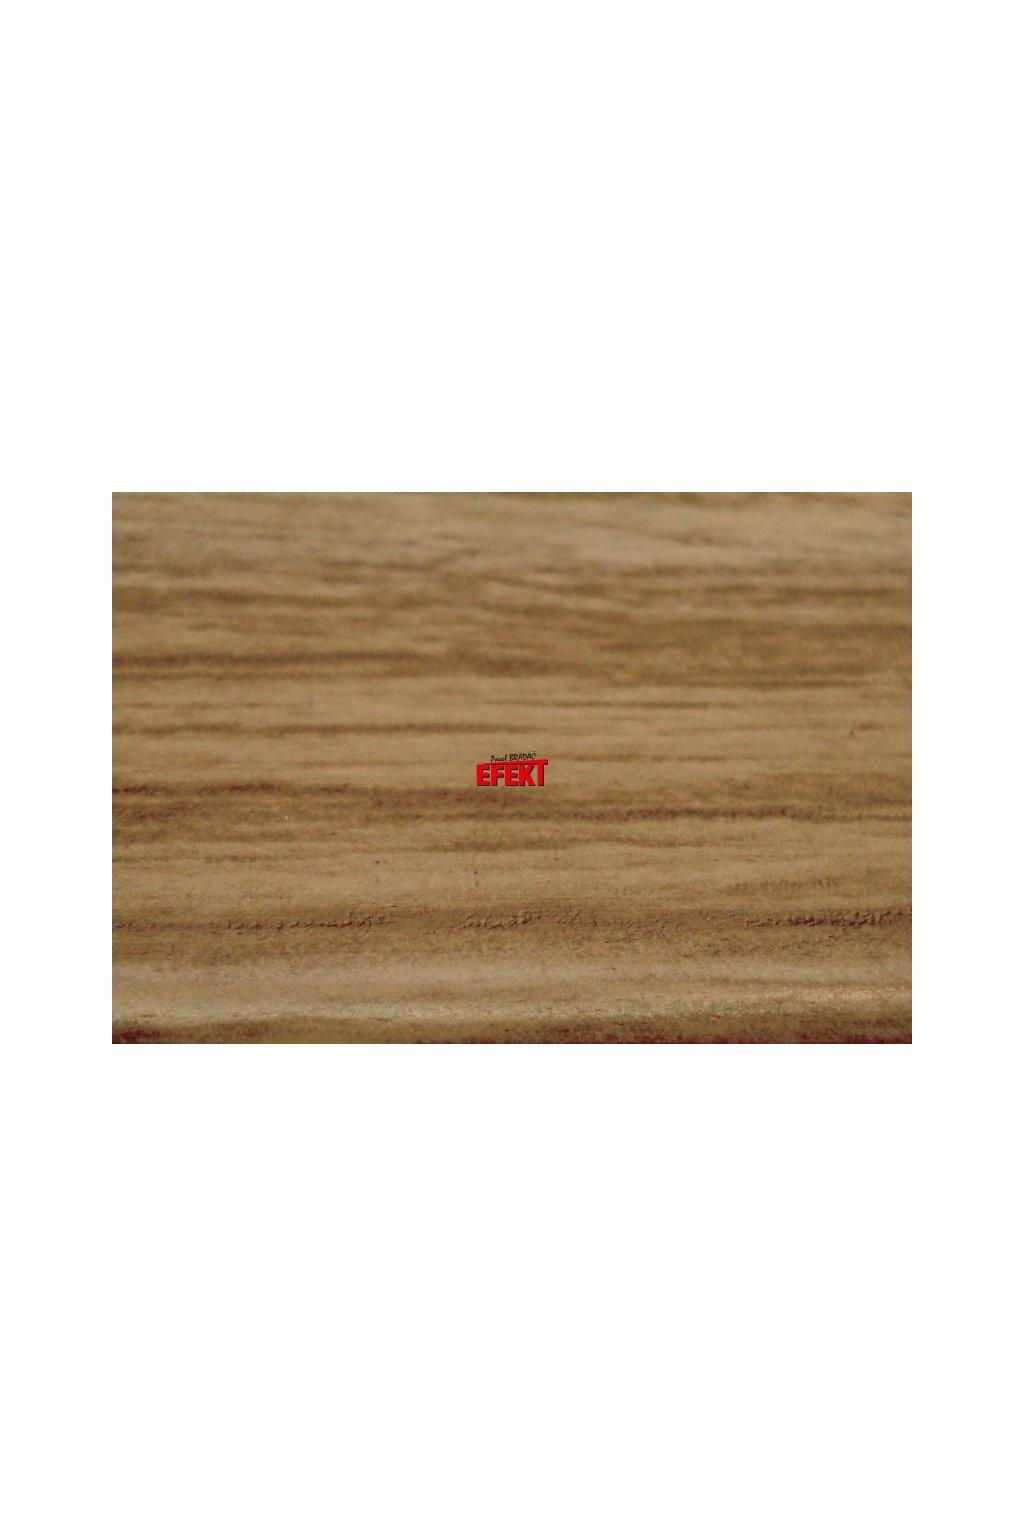 Plastová soklová lišta Bolta 5cm 8602 nový dub